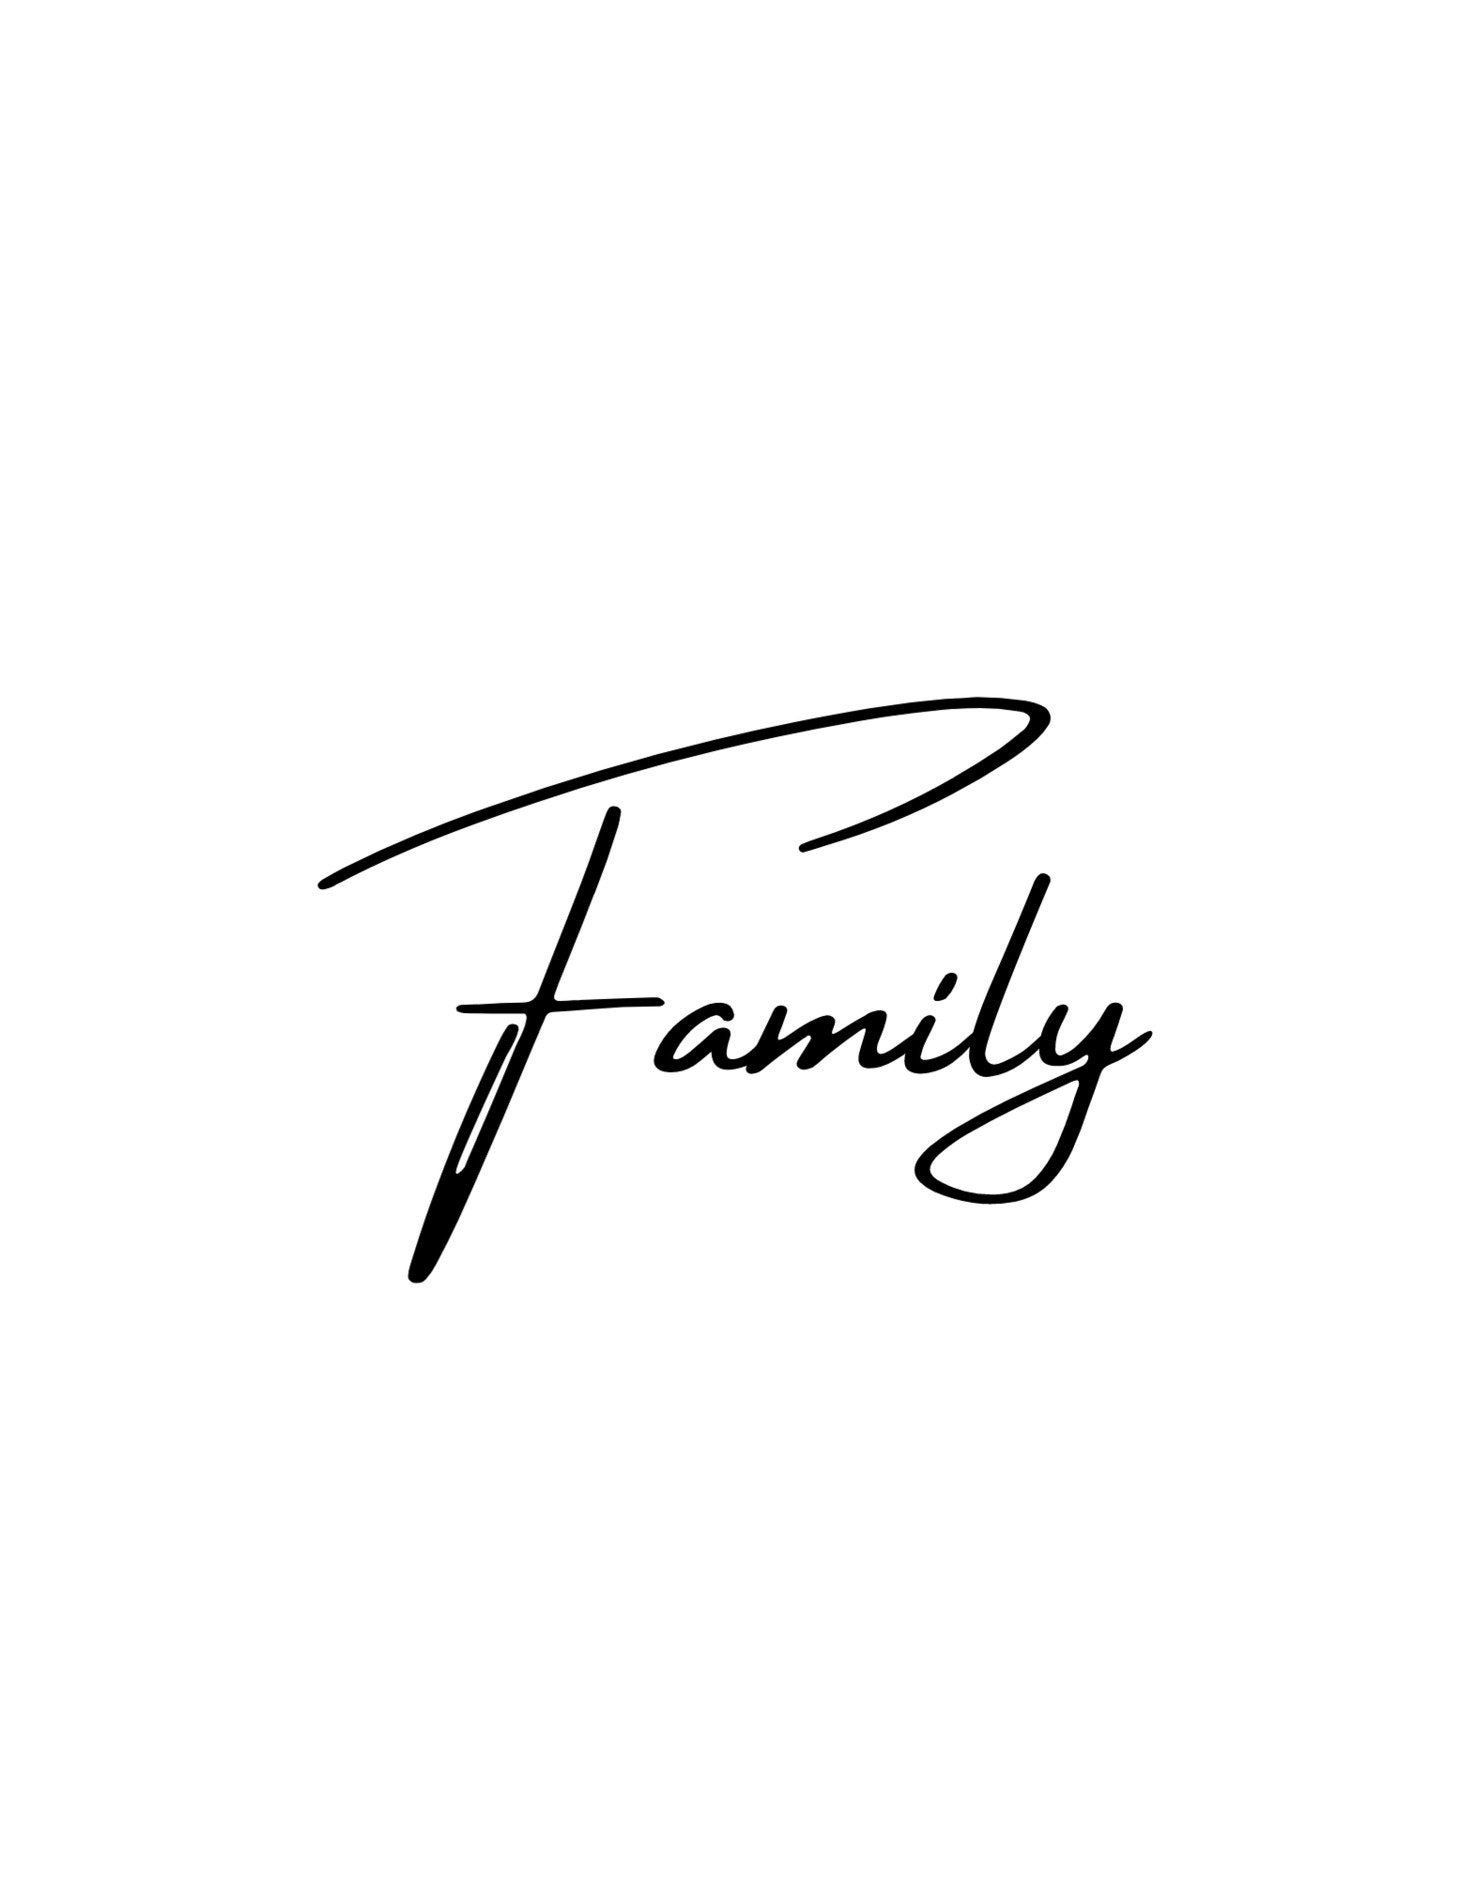 Family Word Digital File Svg Png Jpg Cricut Silhouette Etsy Word Families Cricut Digital Files